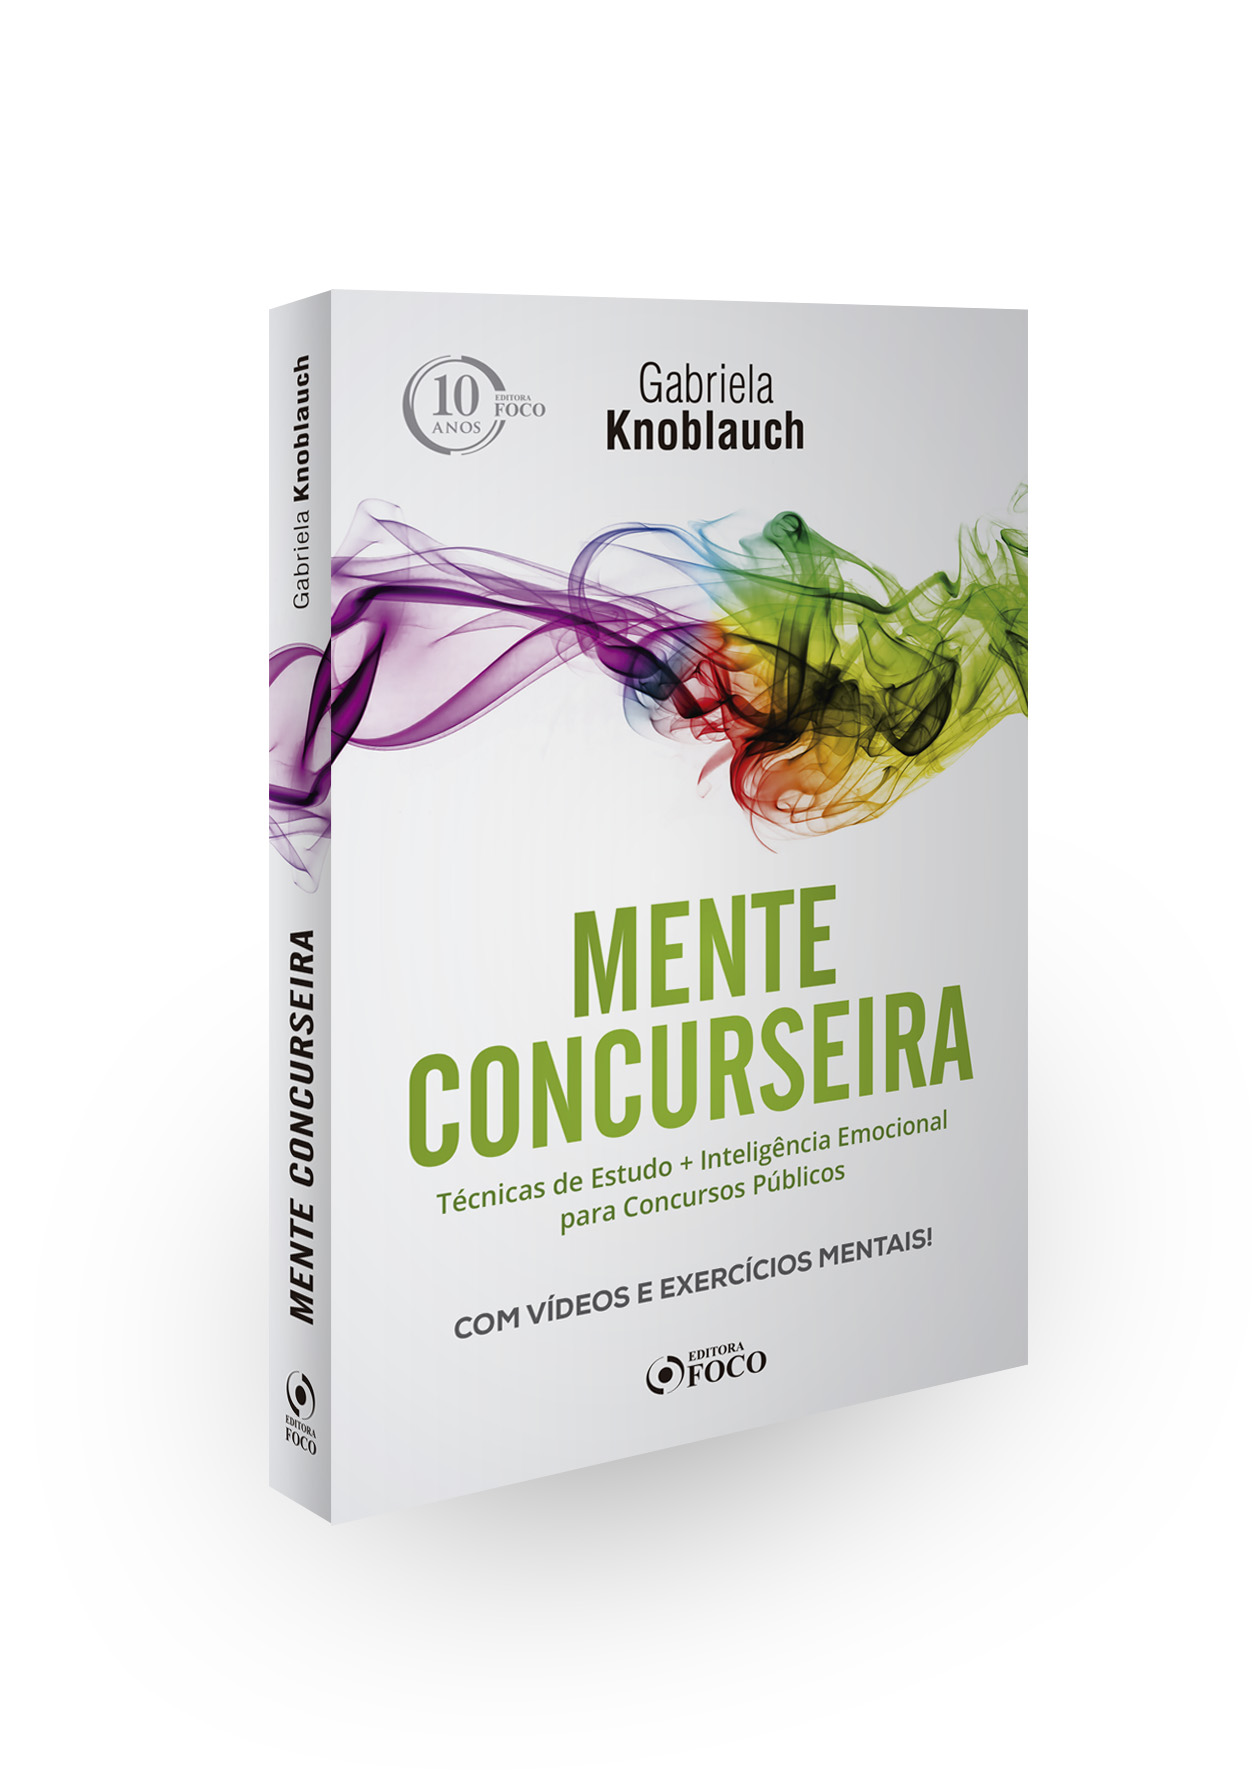 MENTE CONCURSEIRA : TÉCNICAS DE ESTUDO E INTELIGÊNCIA EMOCIONAL PARA CONCURSOS - 1ª ED - 2018